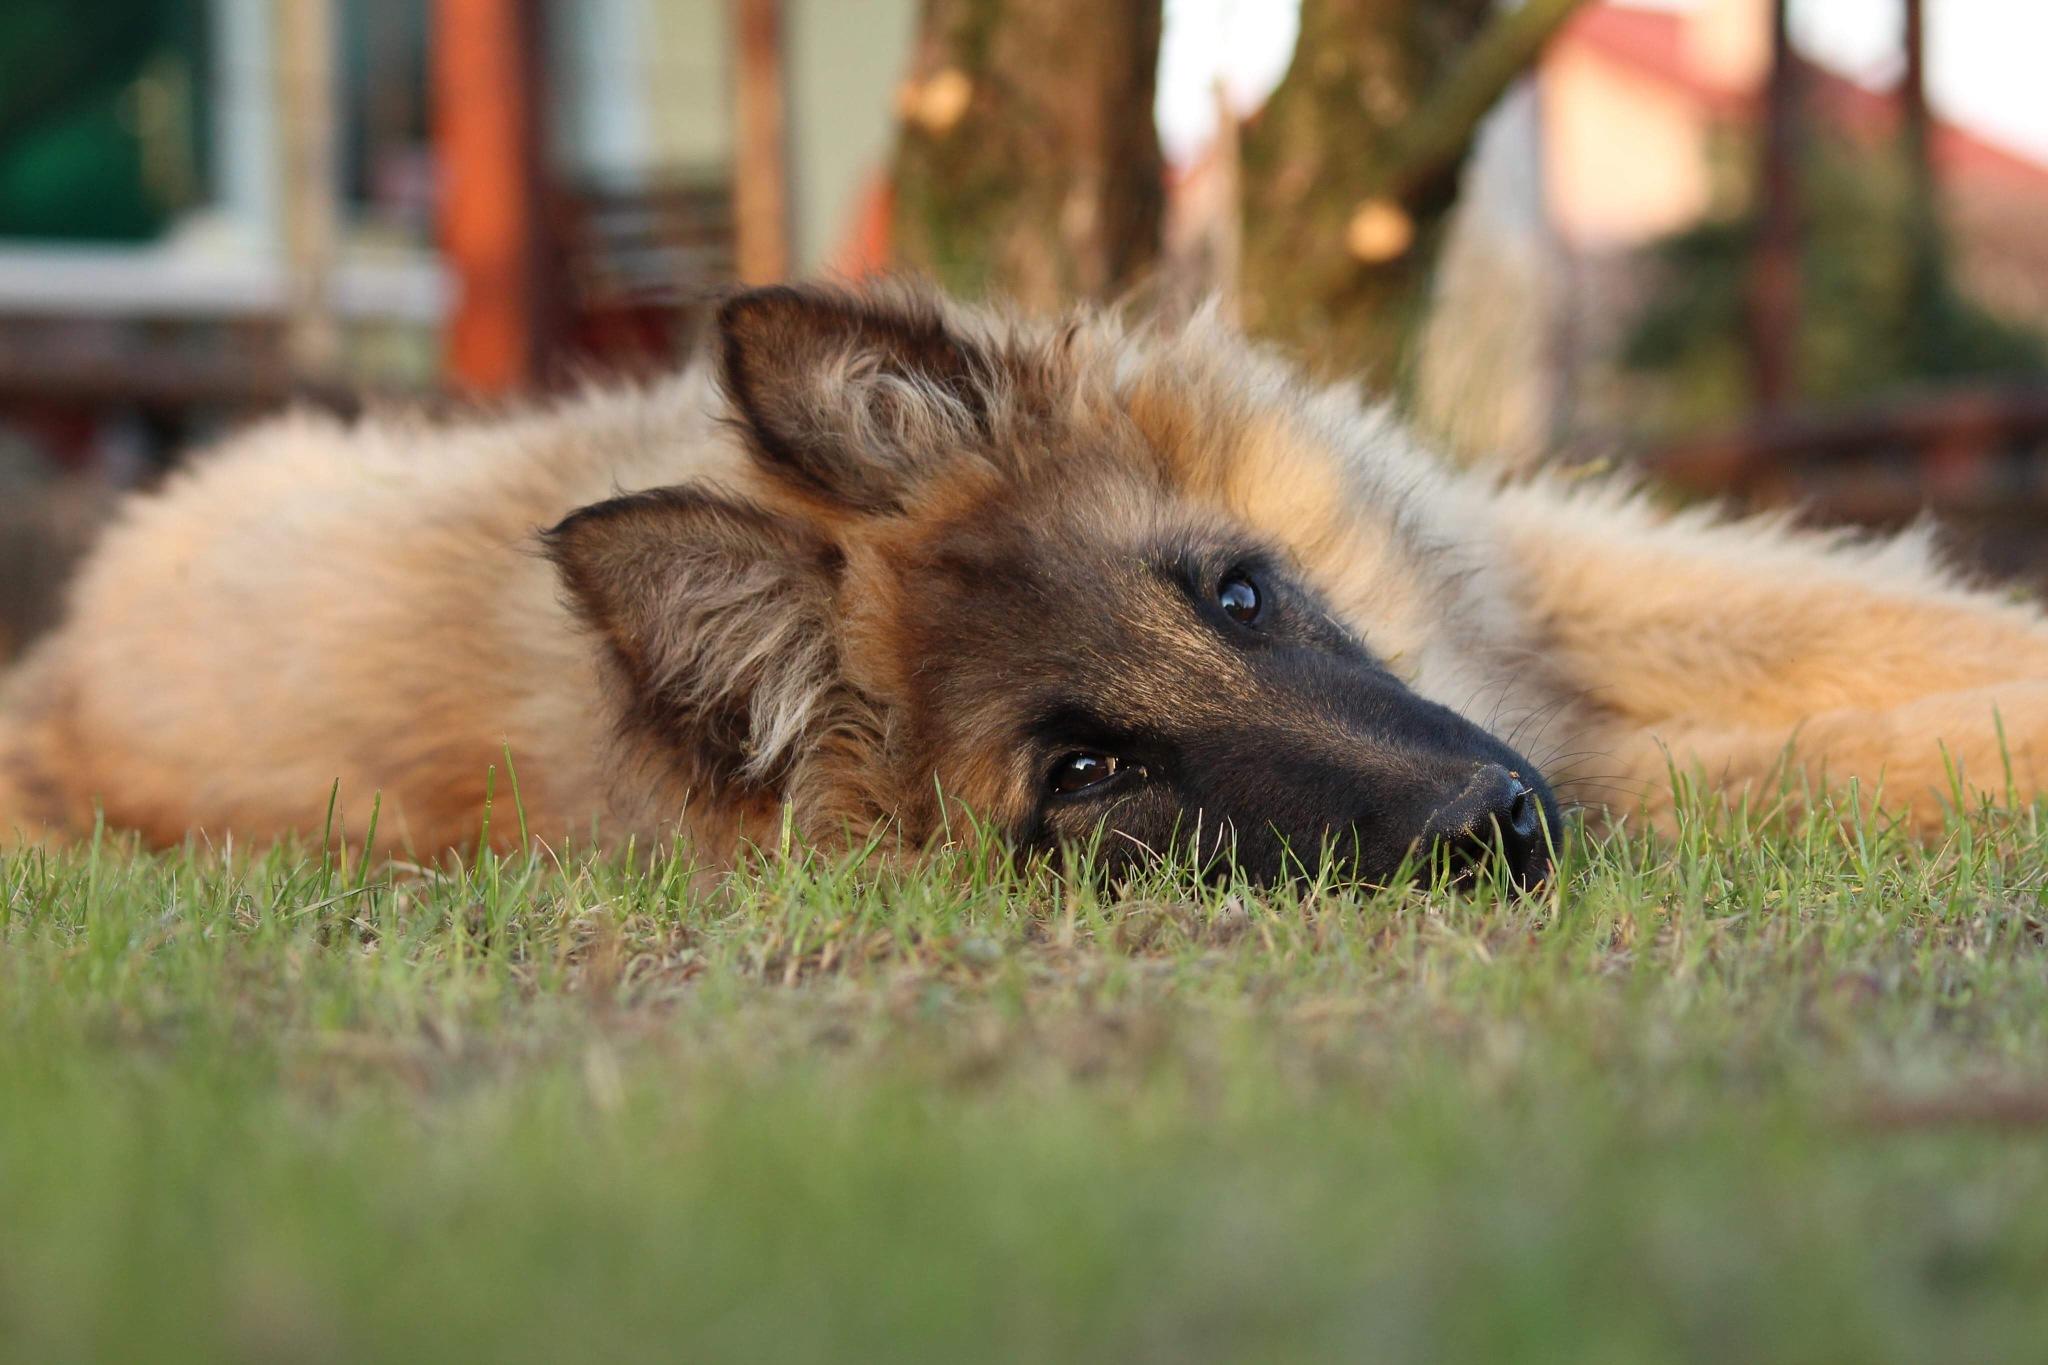 Puppy by Sáfrány Mónika